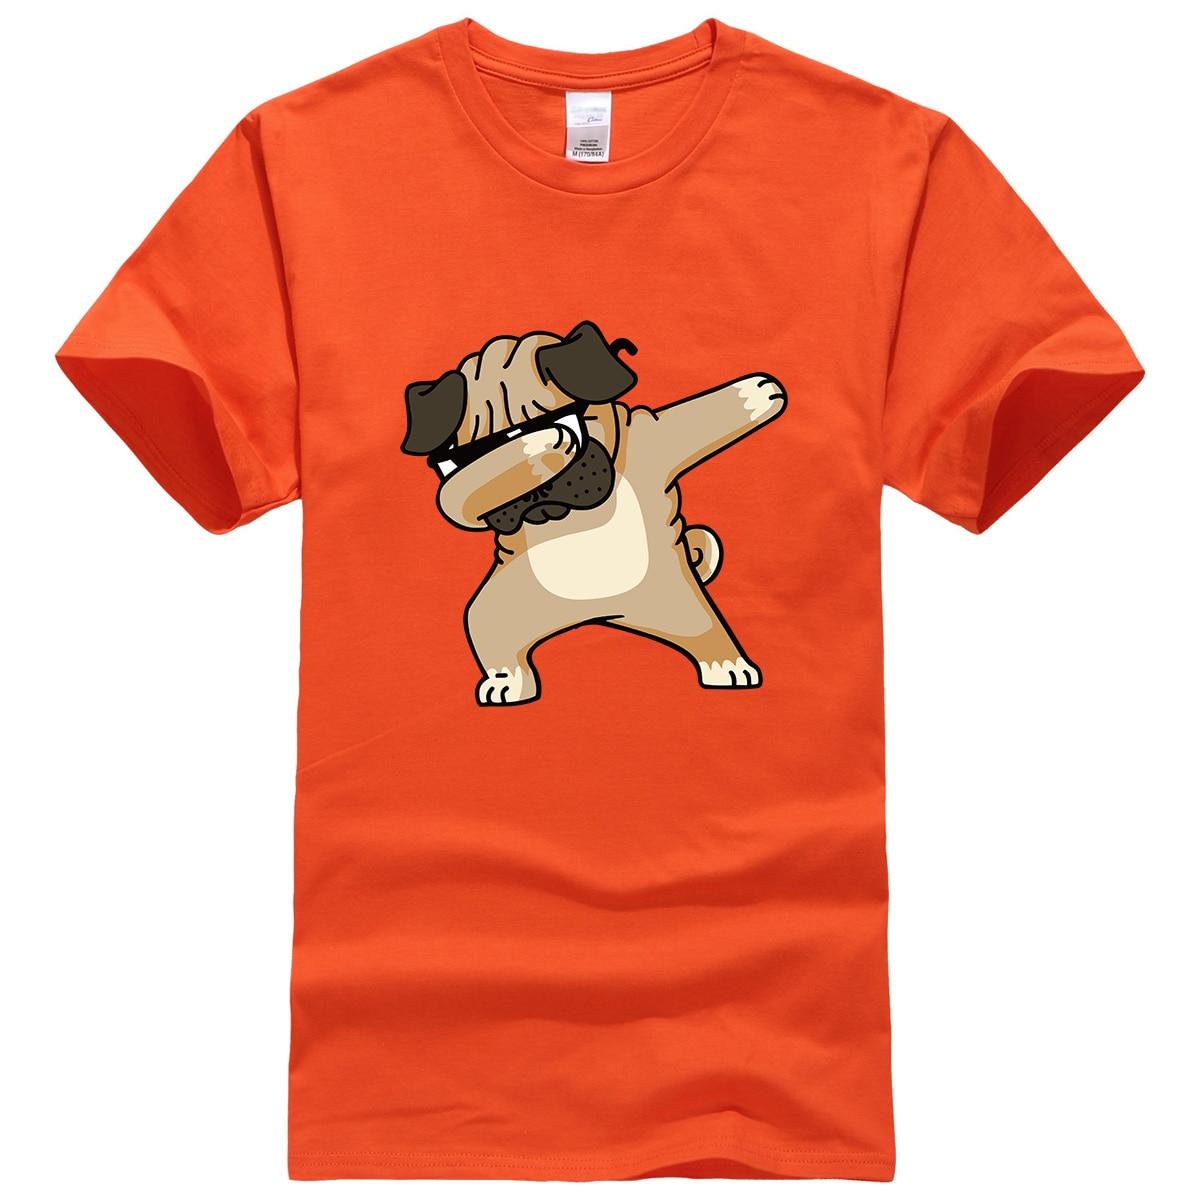 New 2019 Summer Fashion DABBING PUG Tshirt Male Hip Hop Dog Tops Tee   Shirts   Streetwear Funny   T     Shirt   Men Harajuku Men's   T  -  shirts